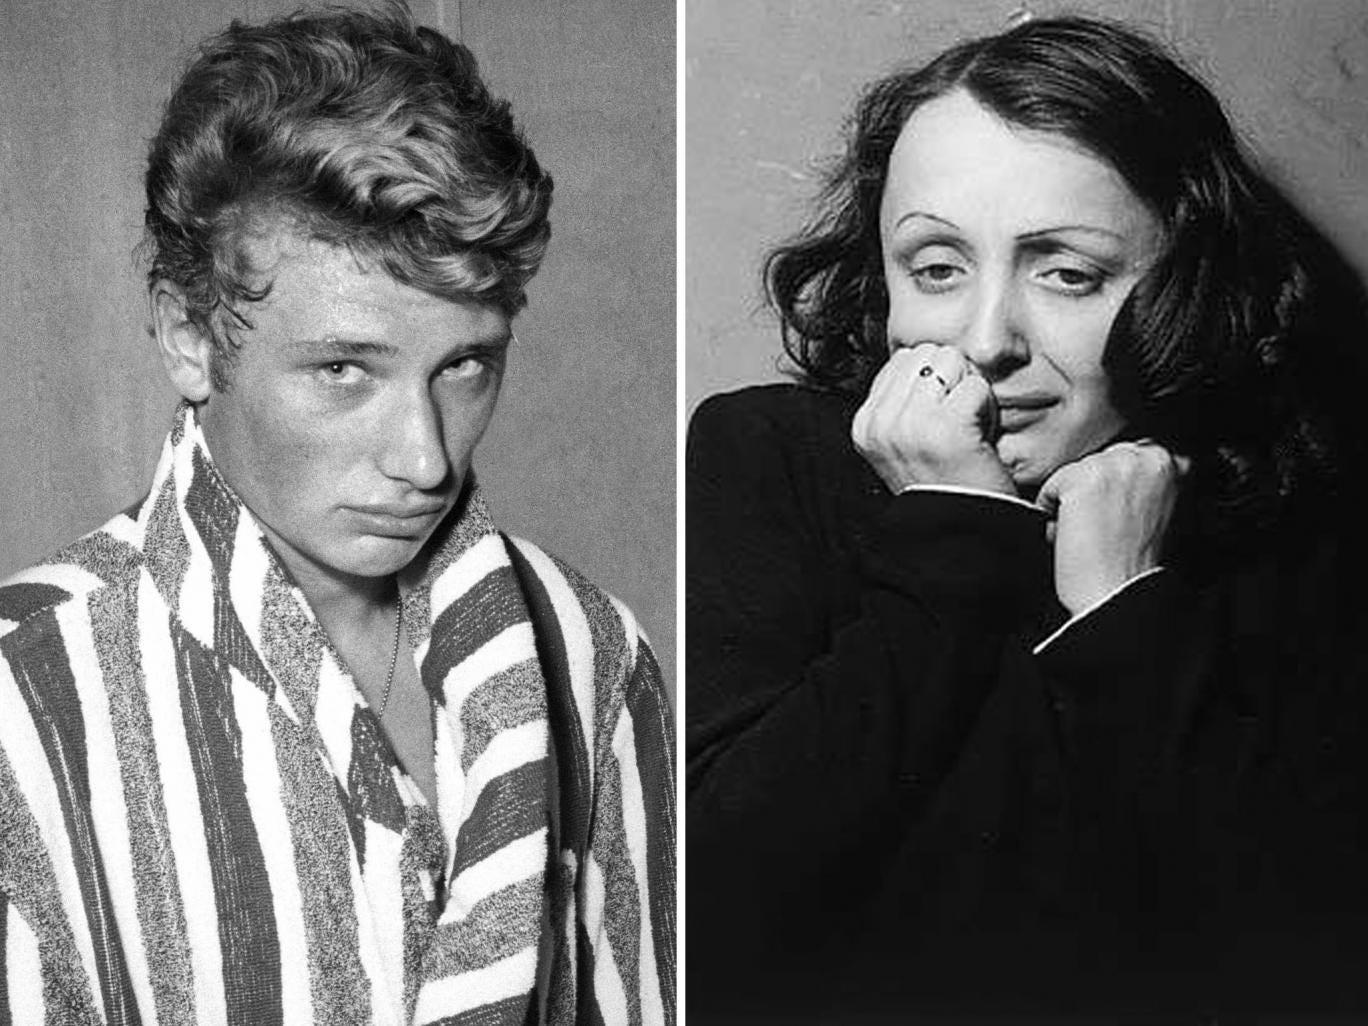 Jonny Hallyday was seduced by Edith Piaf